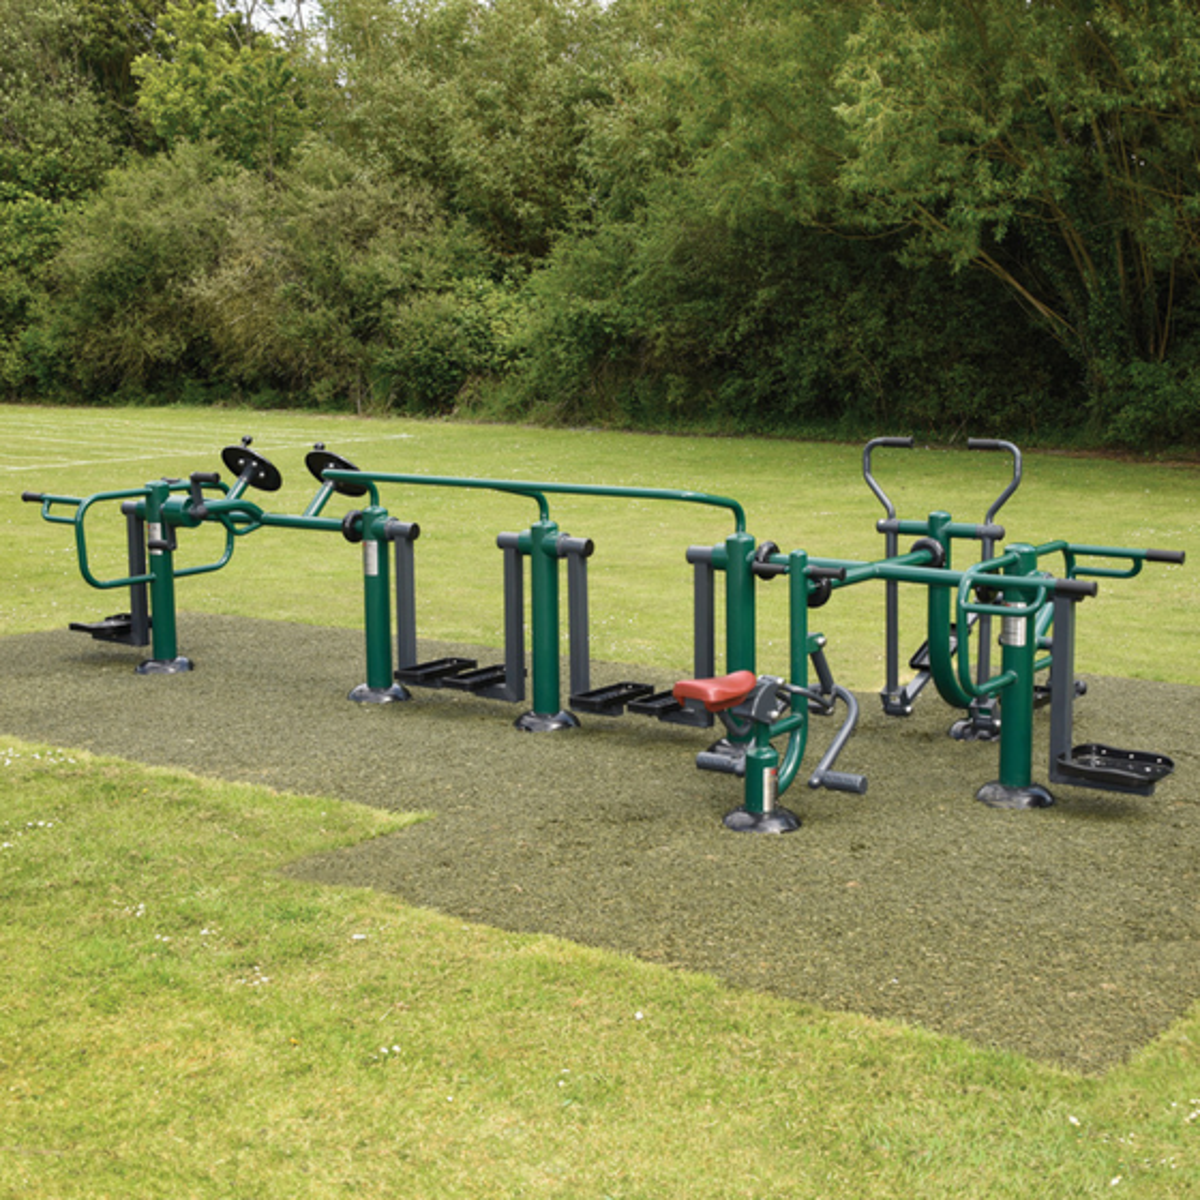 Integr8 Multi Gym | Sunshine Gym | Outdoor Gym Equipment